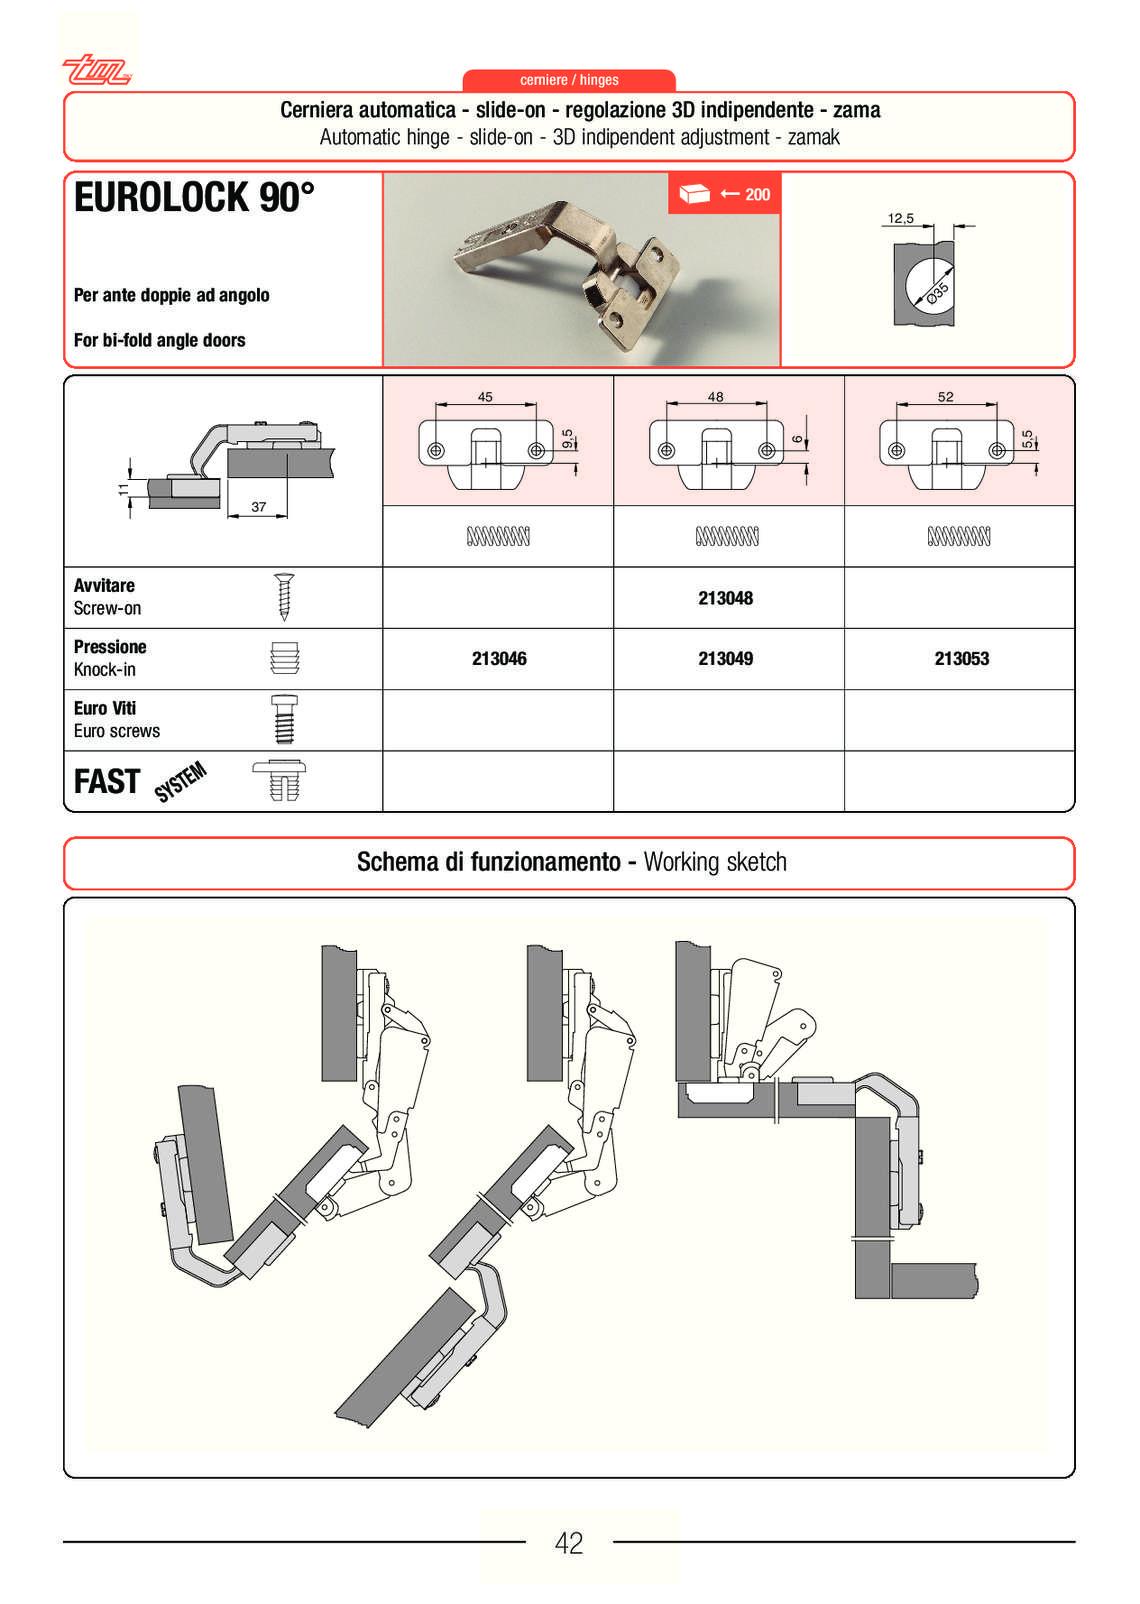 euro-hinges-catalogue_175_041.jpg